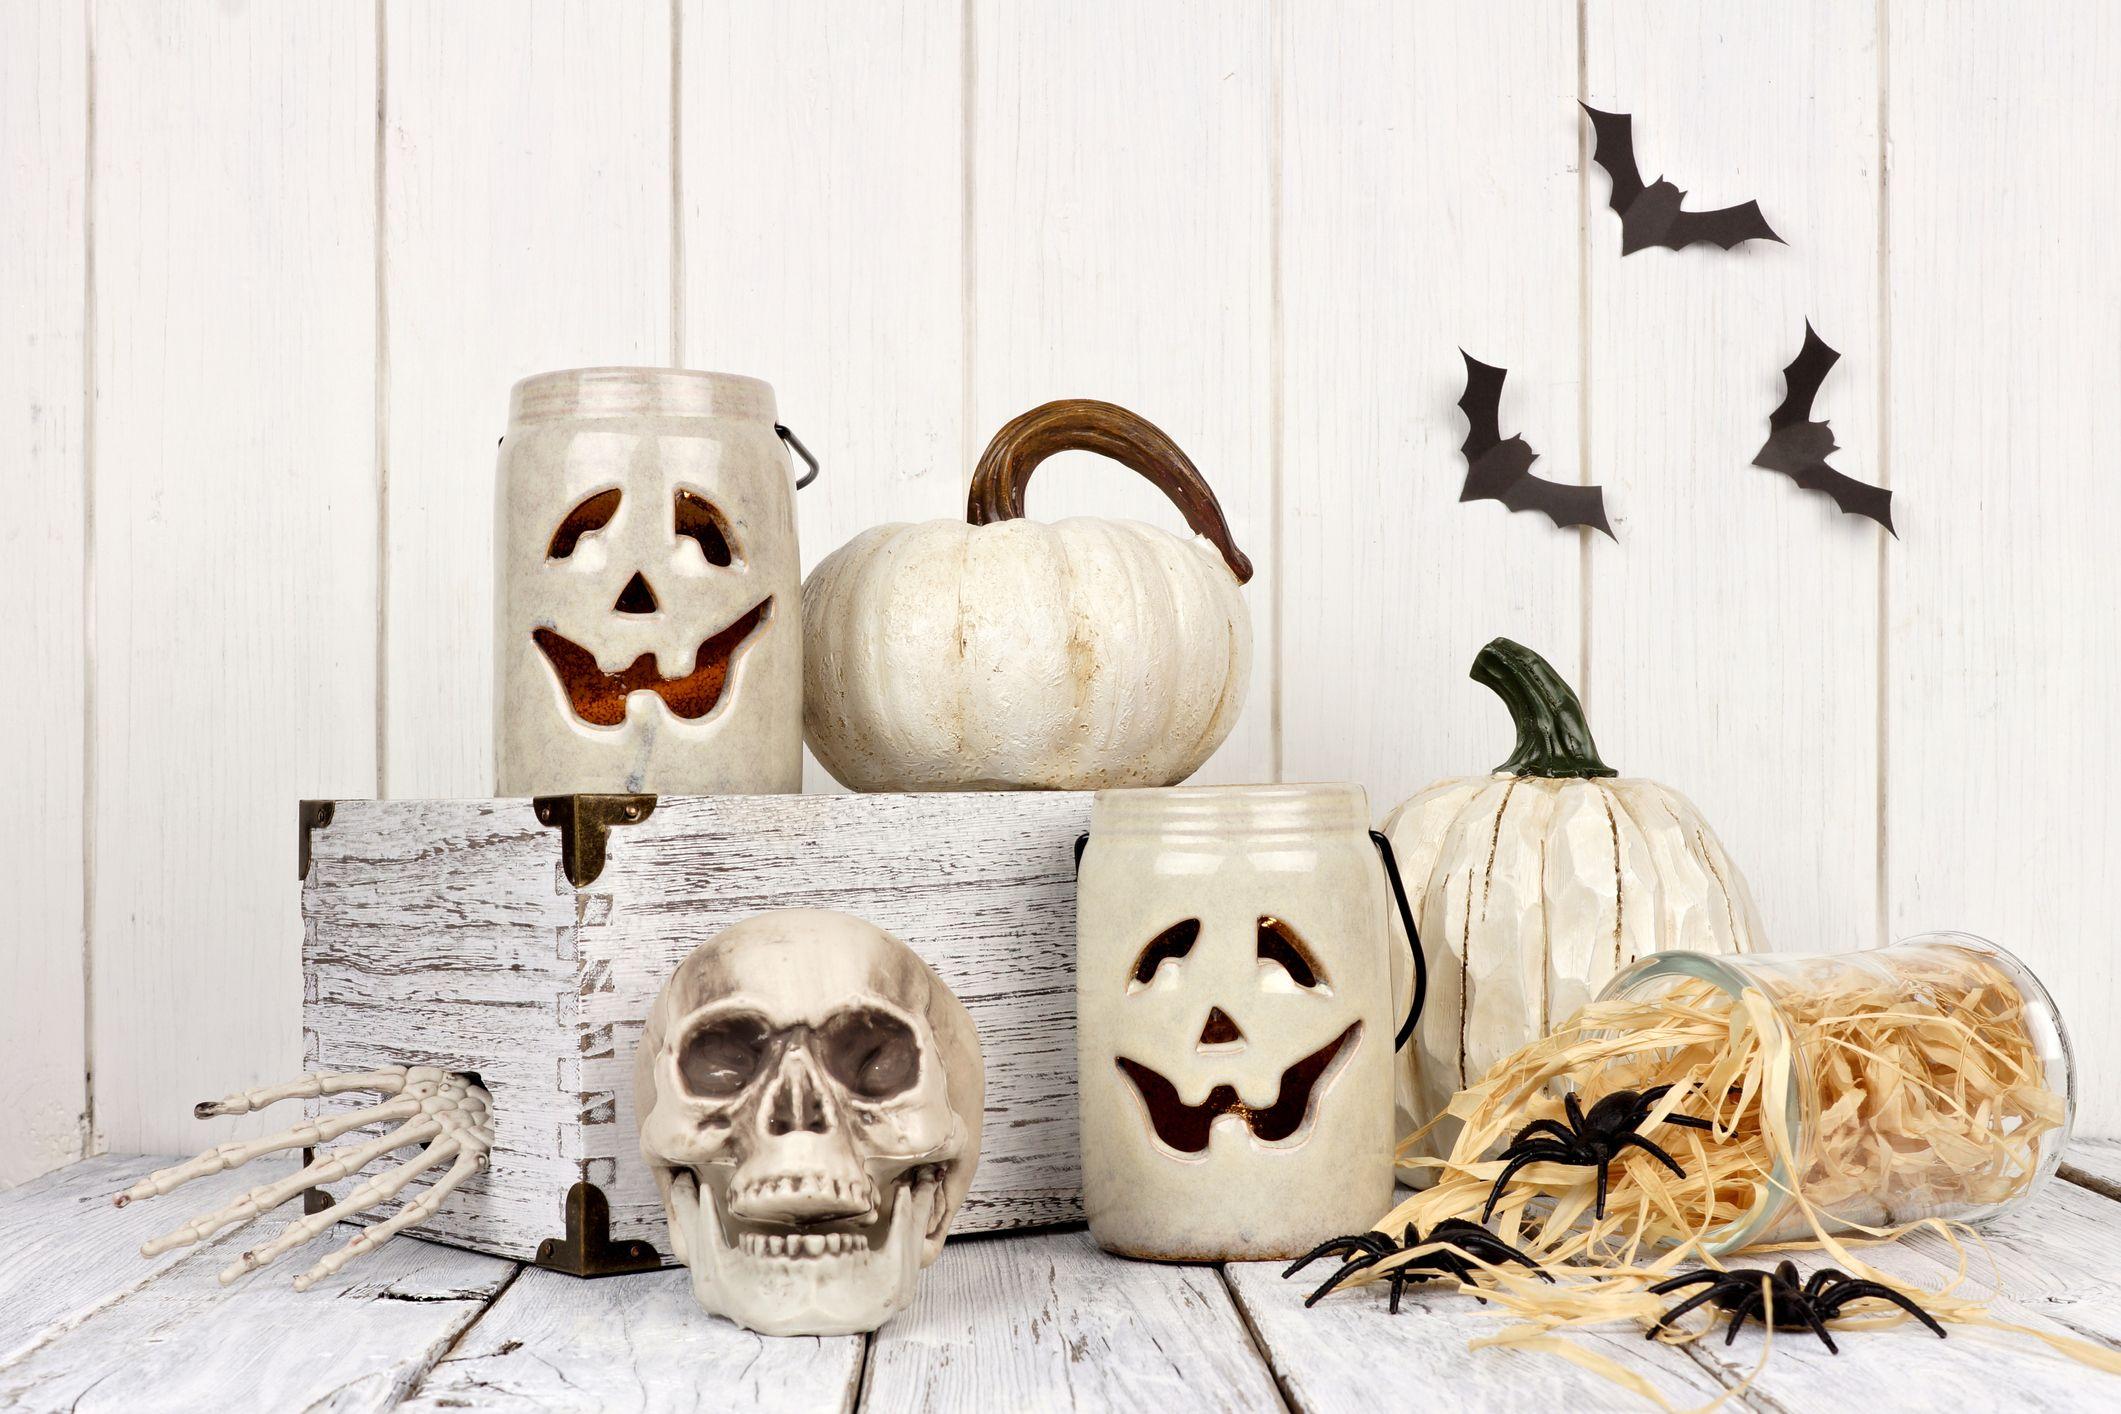 Skulls Mummy Ghosts Craft kits to make Earrings  Halloween designs   Bats